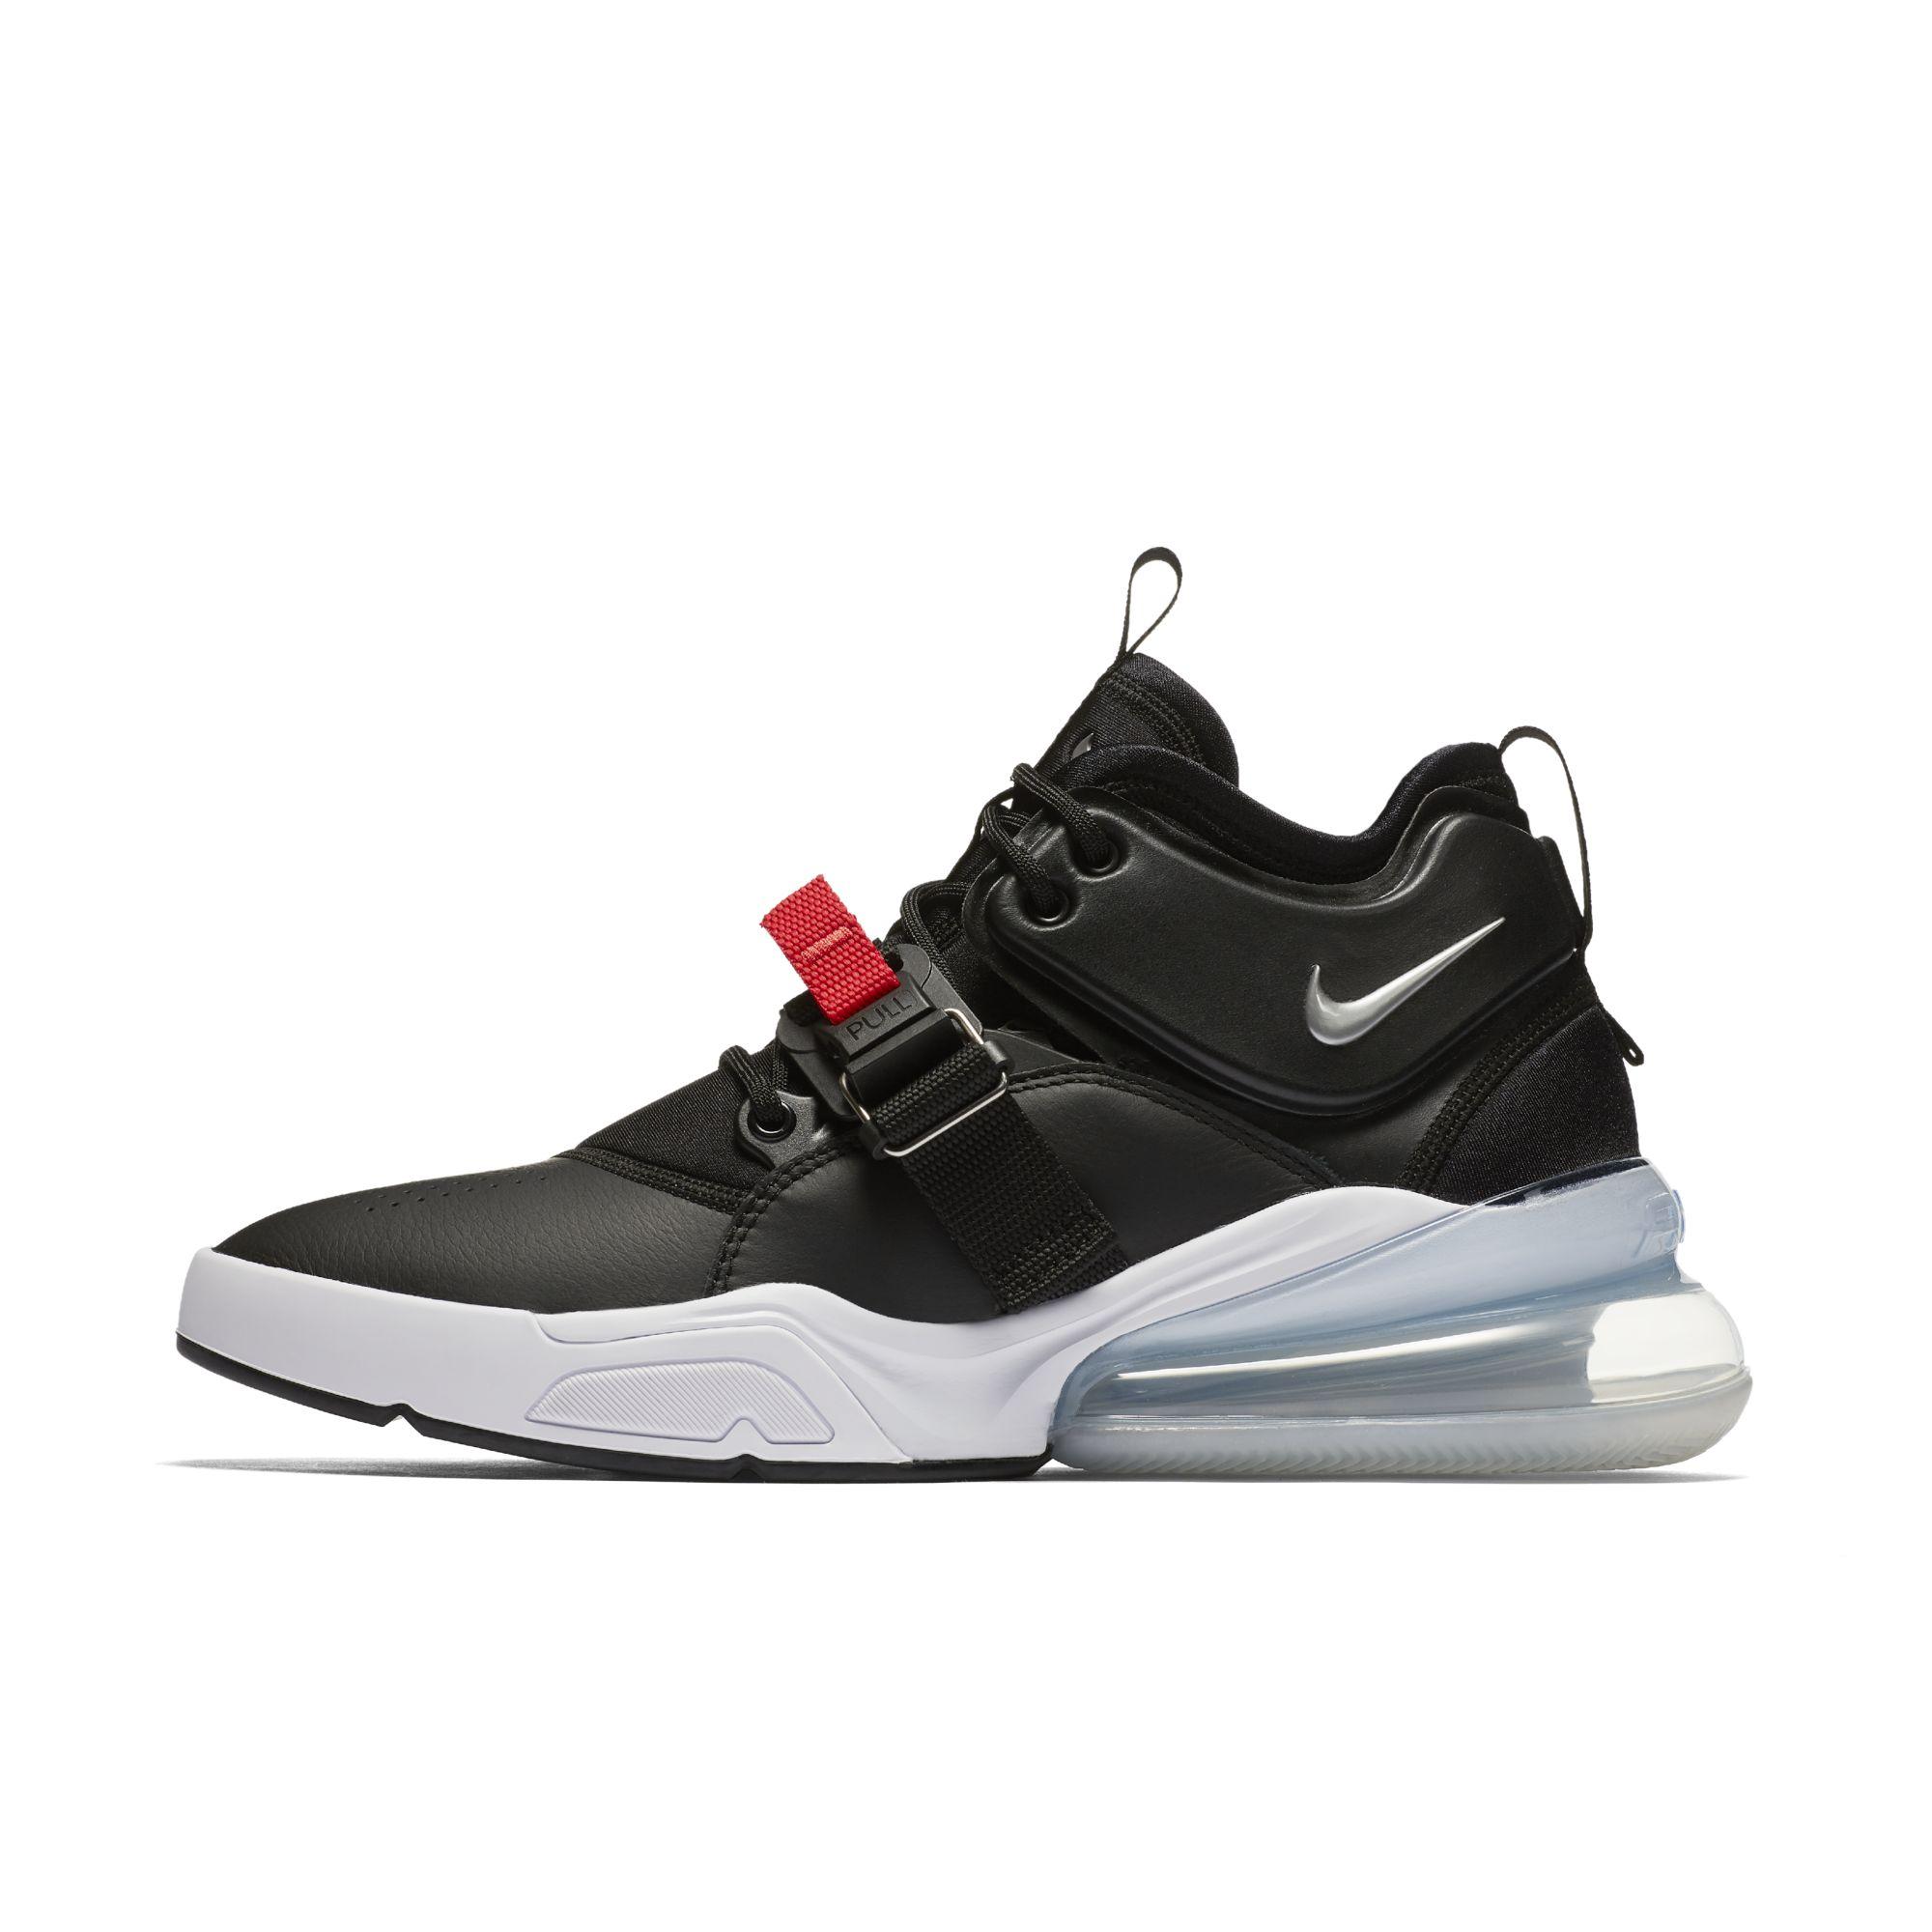 Nike Air Force 270 Drops